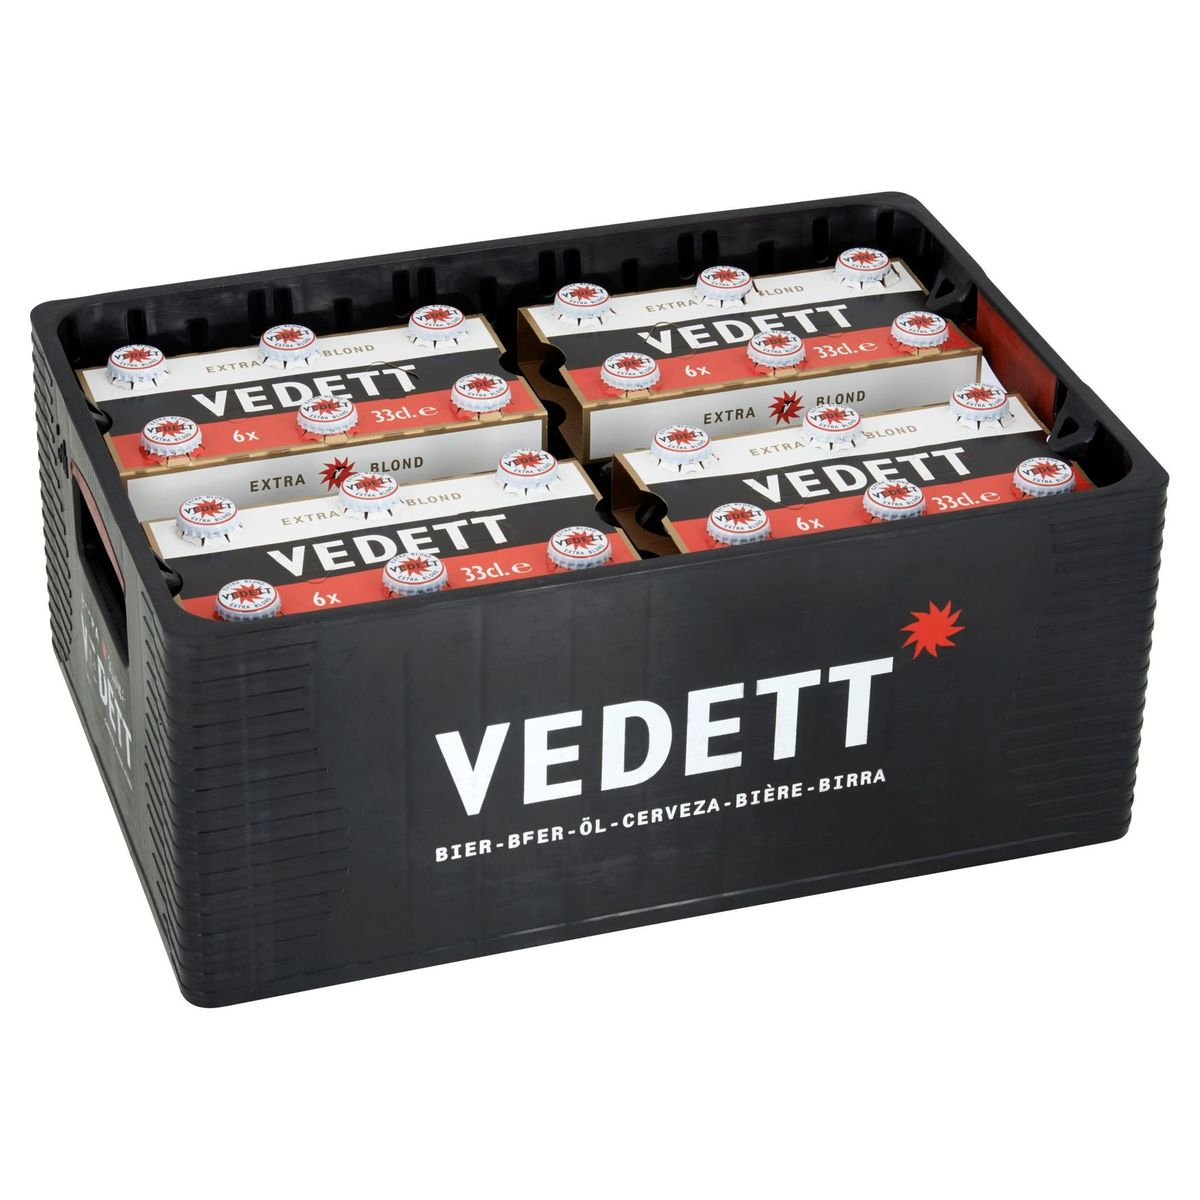 Vedett Extra Blond Bier Krat 24 x 33 cl